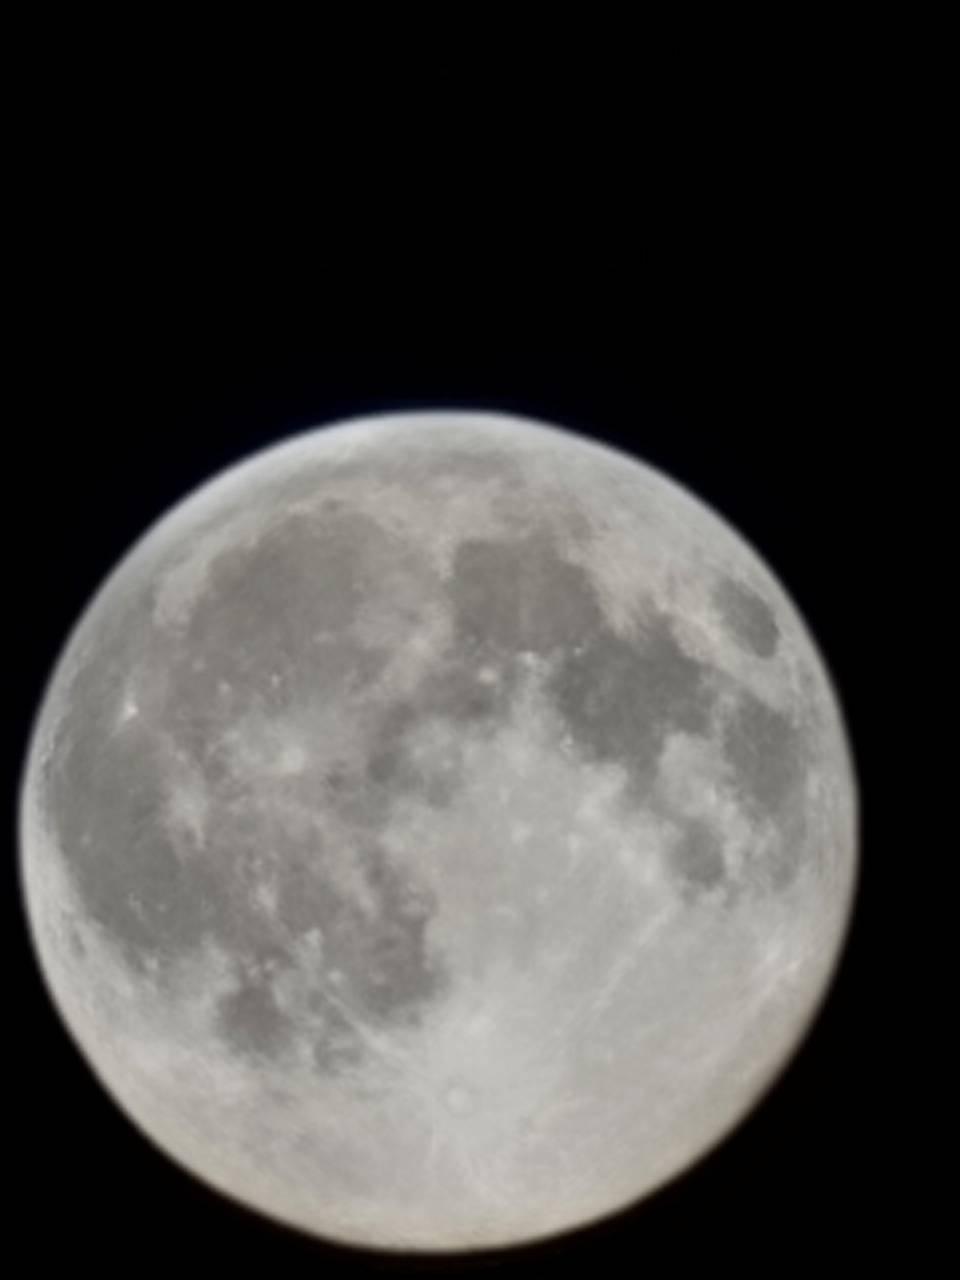 moon glaxy S21 ultra